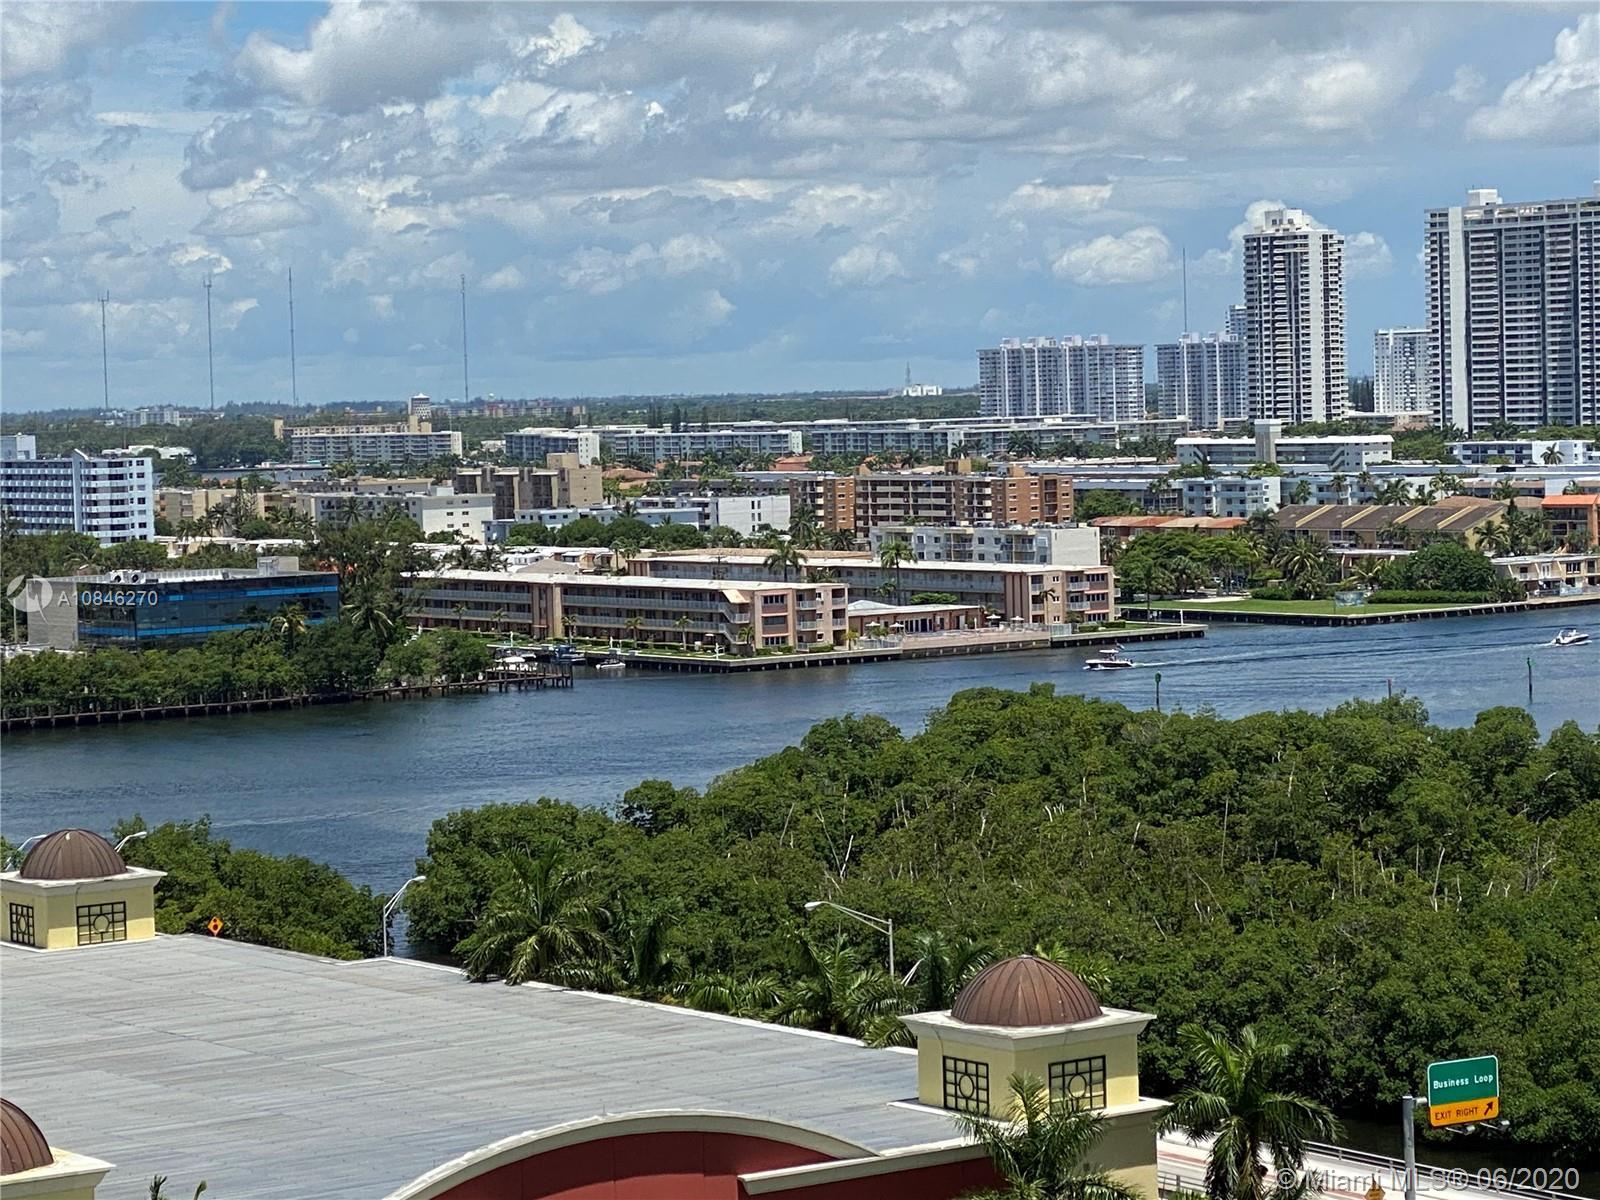 Parque Tower 2 #5-1205 - 330 Sunny Isles Blvd #5-1205, Sunny Isles Beach, FL 33160